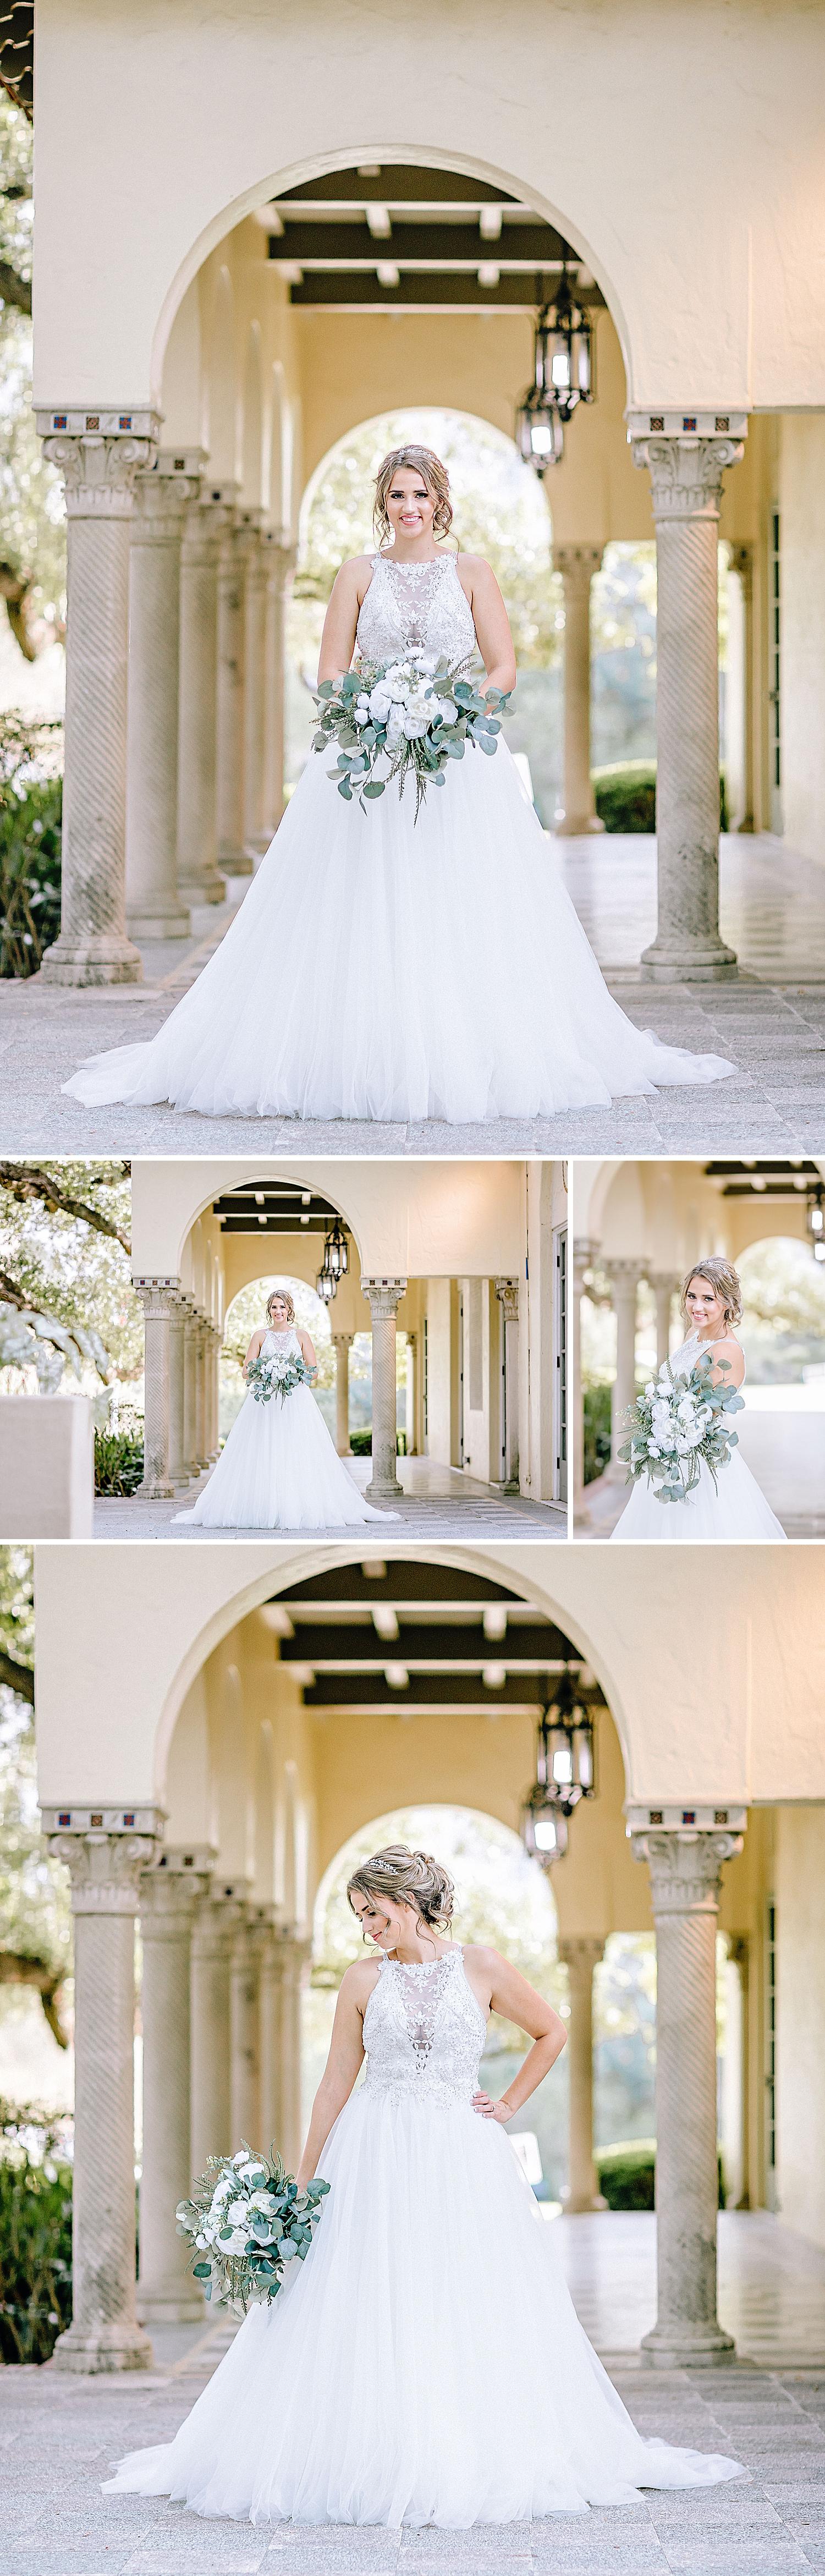 San-Antonio-Weddings-Bridal-Photos-Carly-Barton-Photography_0004.jpg